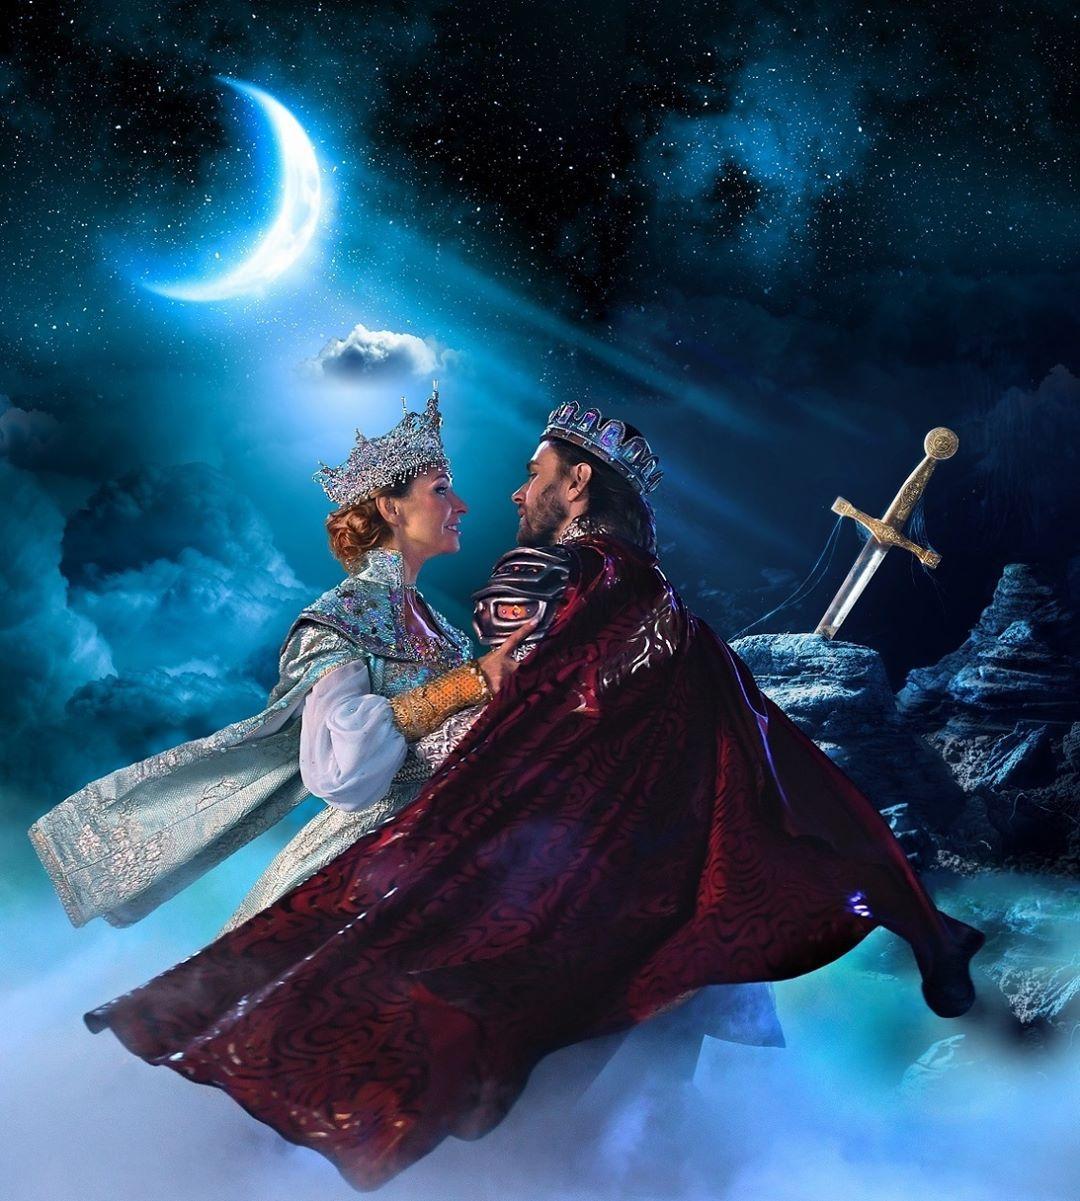 Татьяна Навка-новости, анонсы - Страница 31 MqDr7v6EPDo